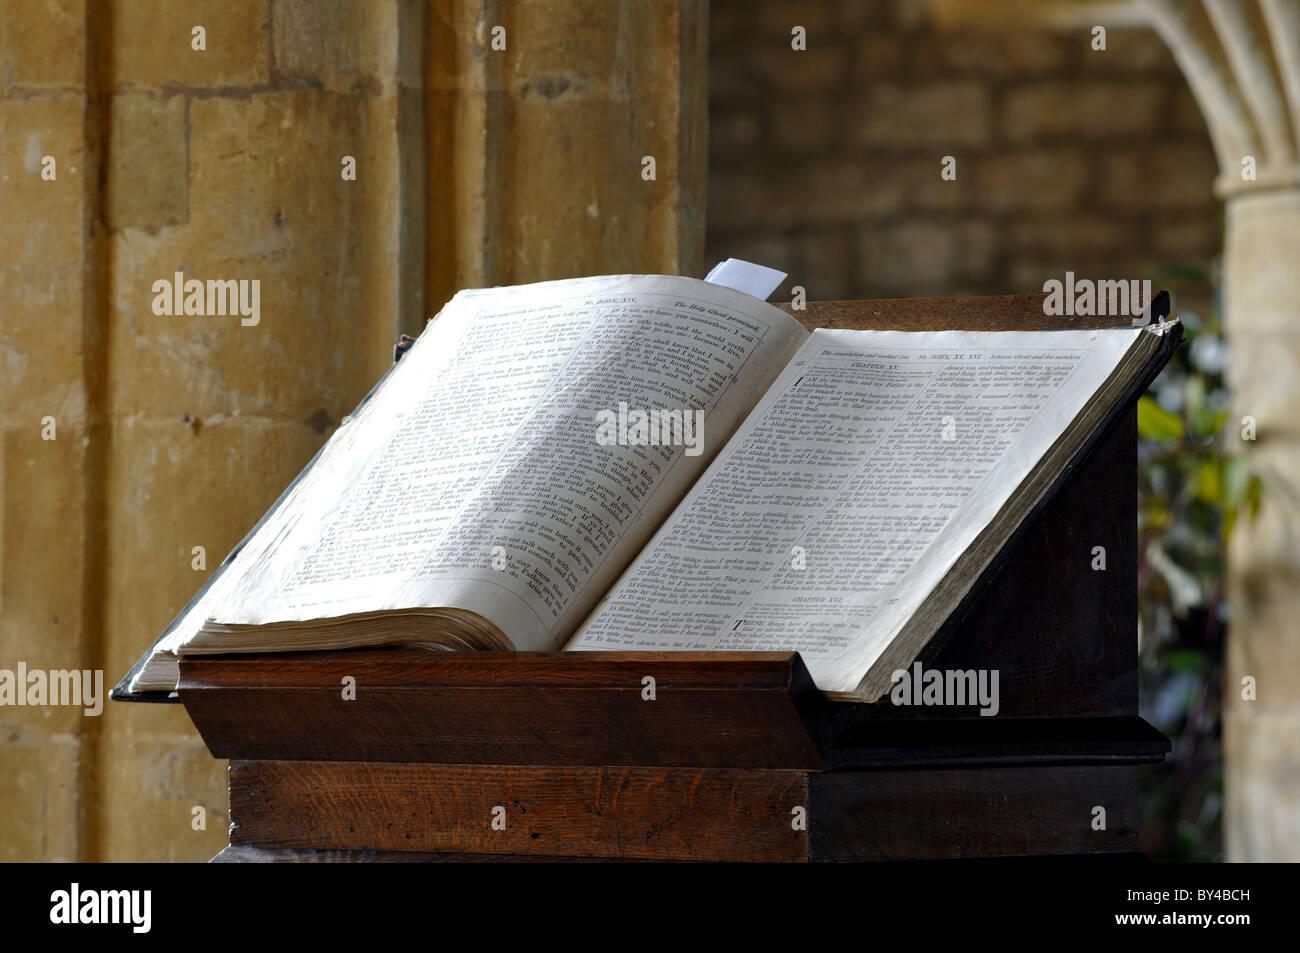 Bible on lectern in church - Stock Image